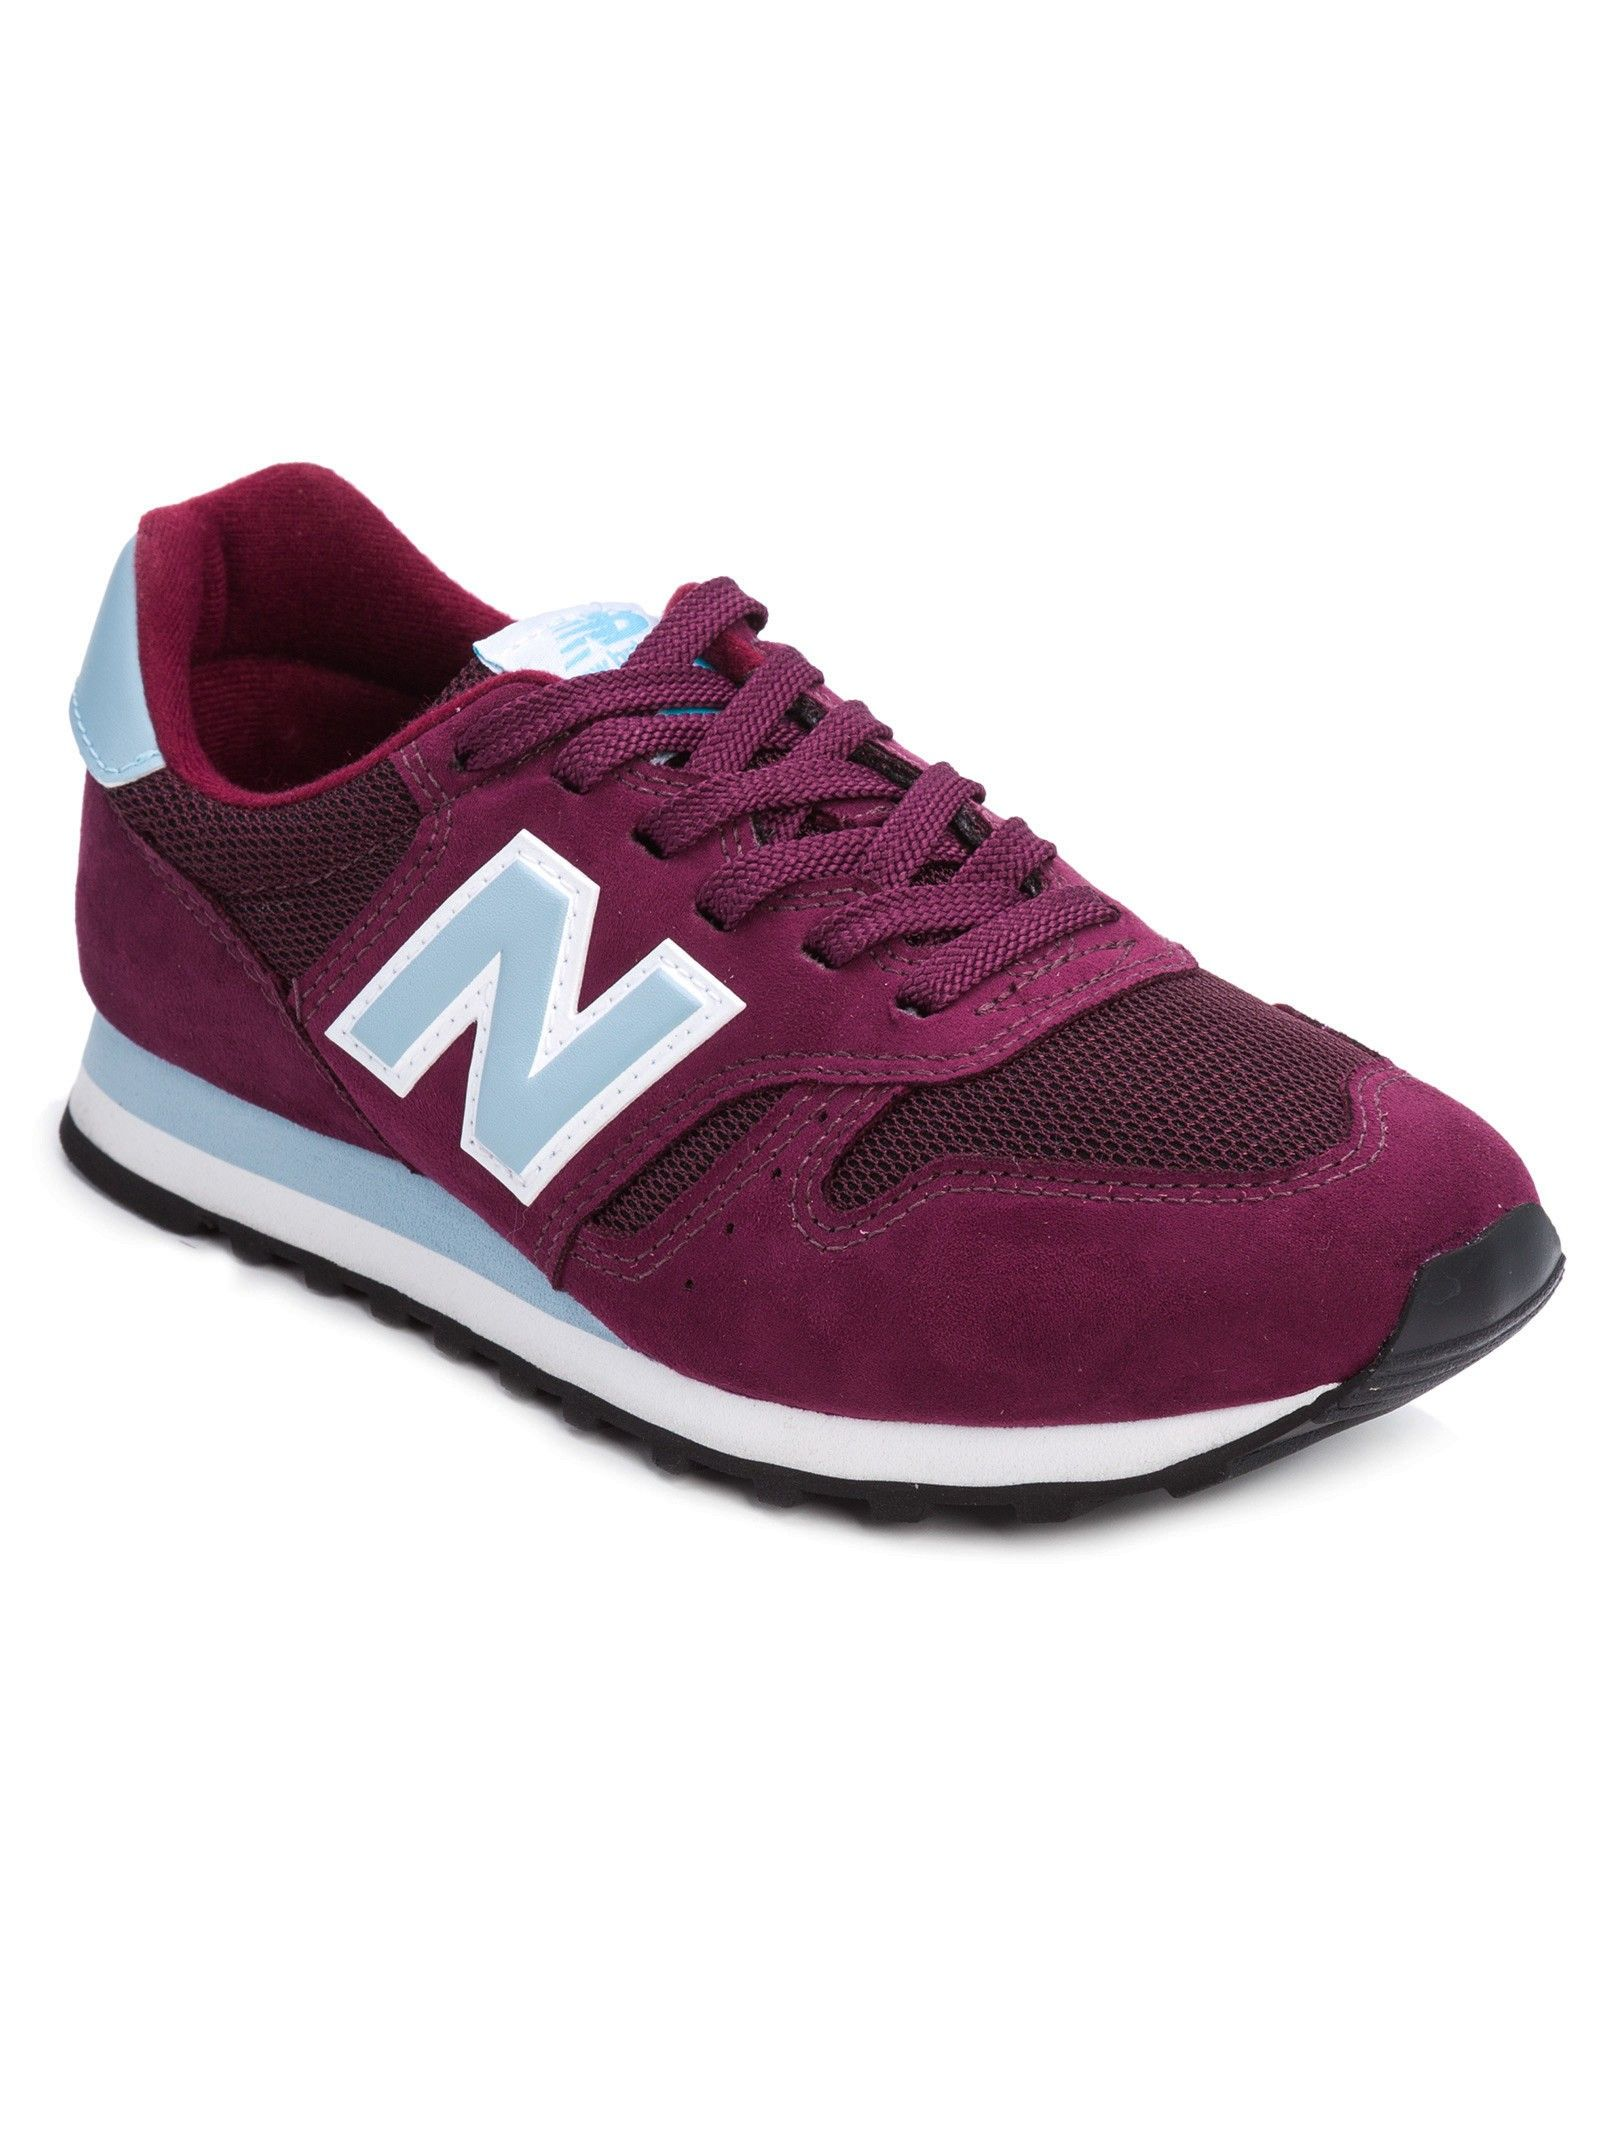 c20292884b7 tenis new balance feminino preto e rosa